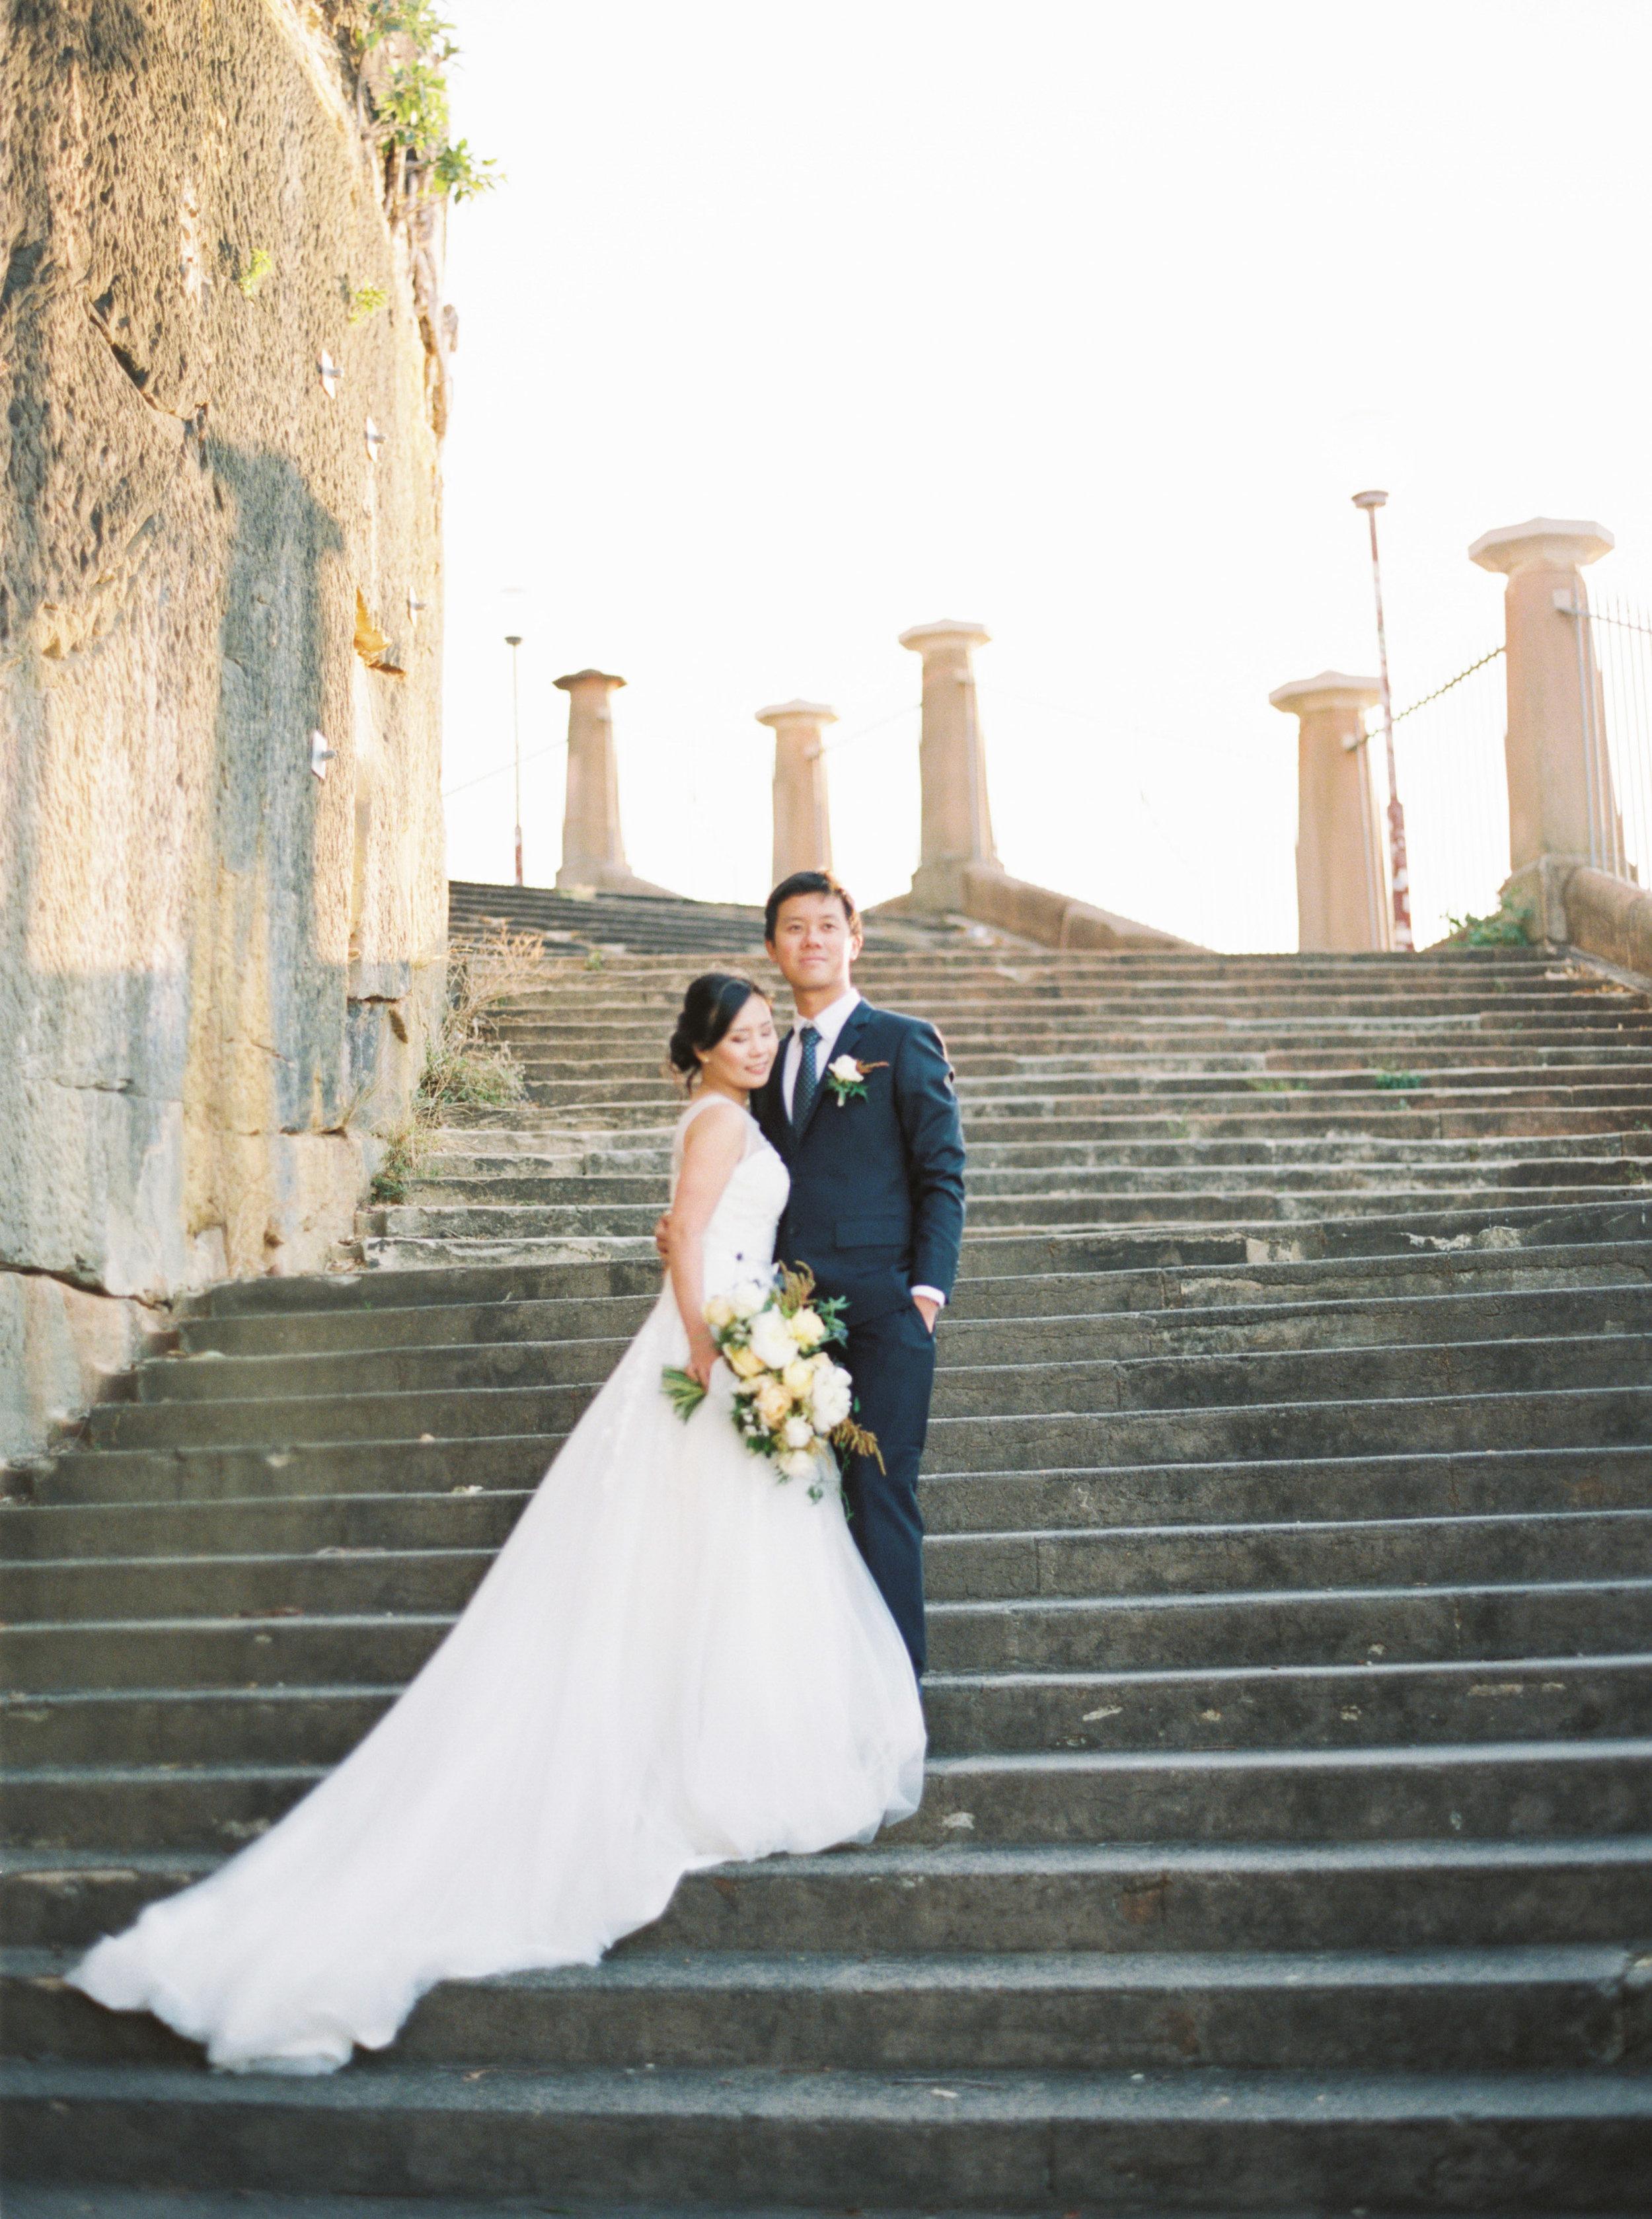 00011- Fine Art Film Australia Destination Sydney Wedding Photographer Sheri McMahon.jpg